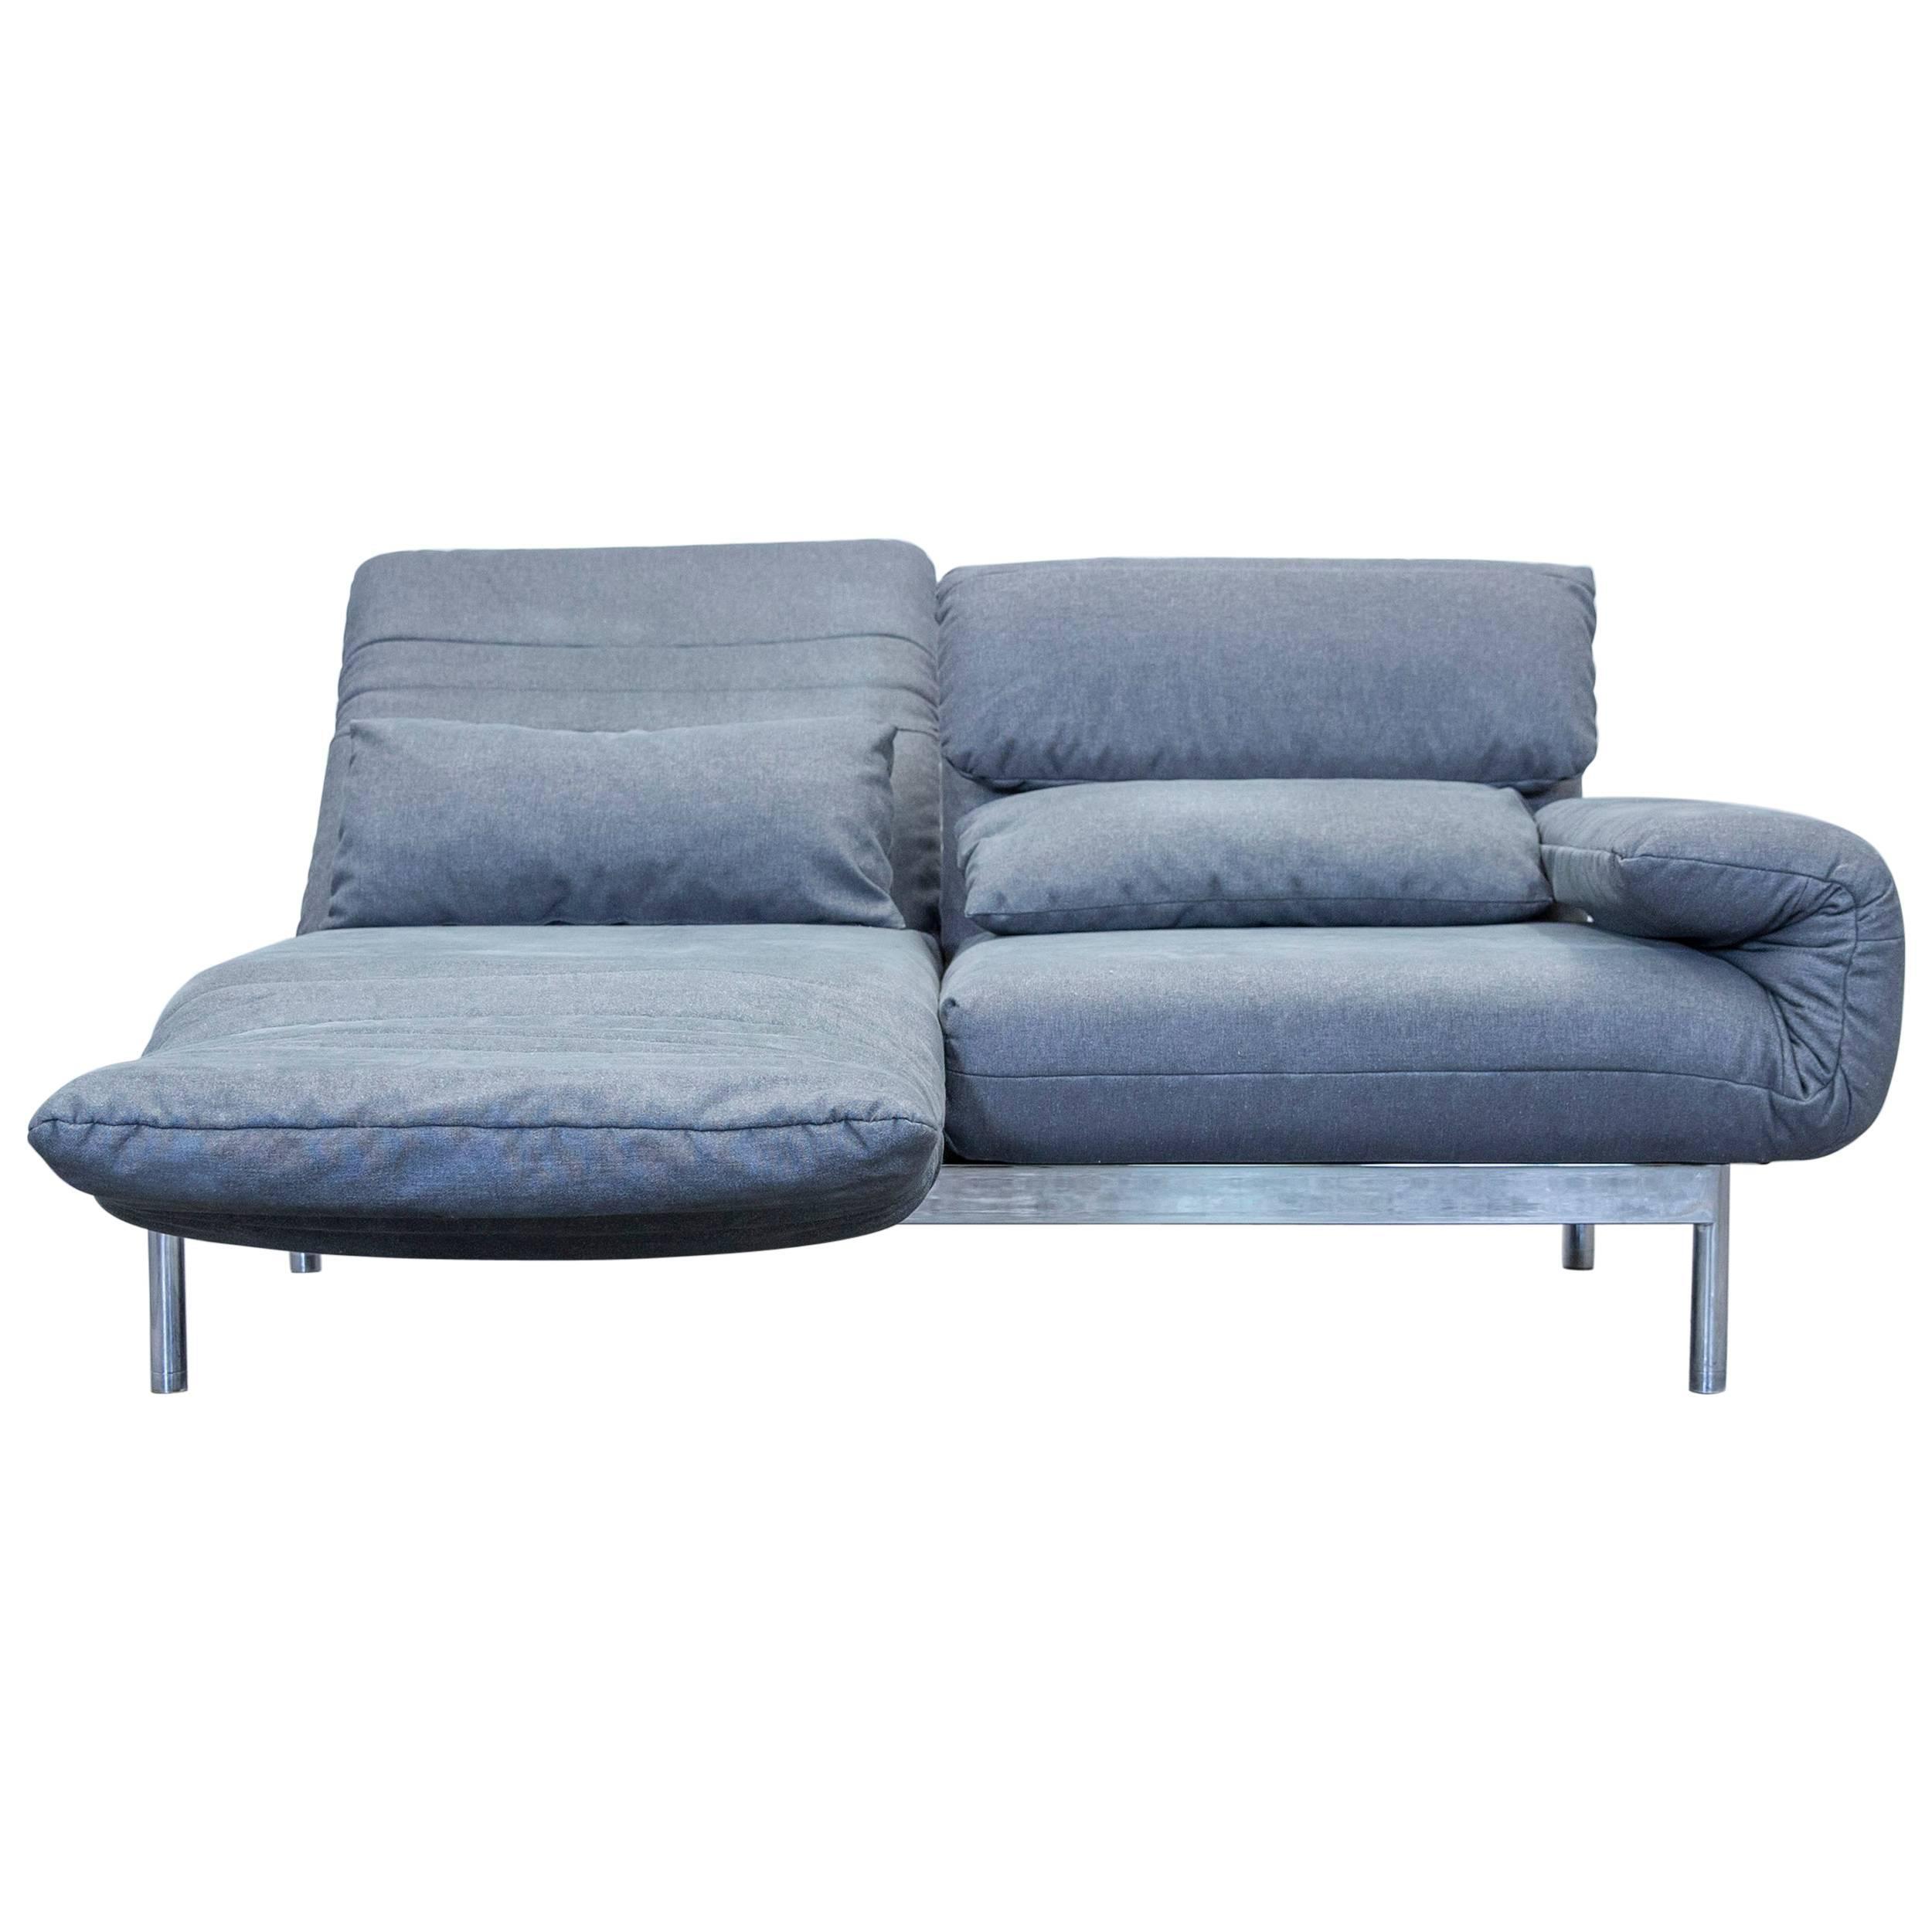 Rolf Benz Plura Plura Corner Sofa With Rolf Benz Plura